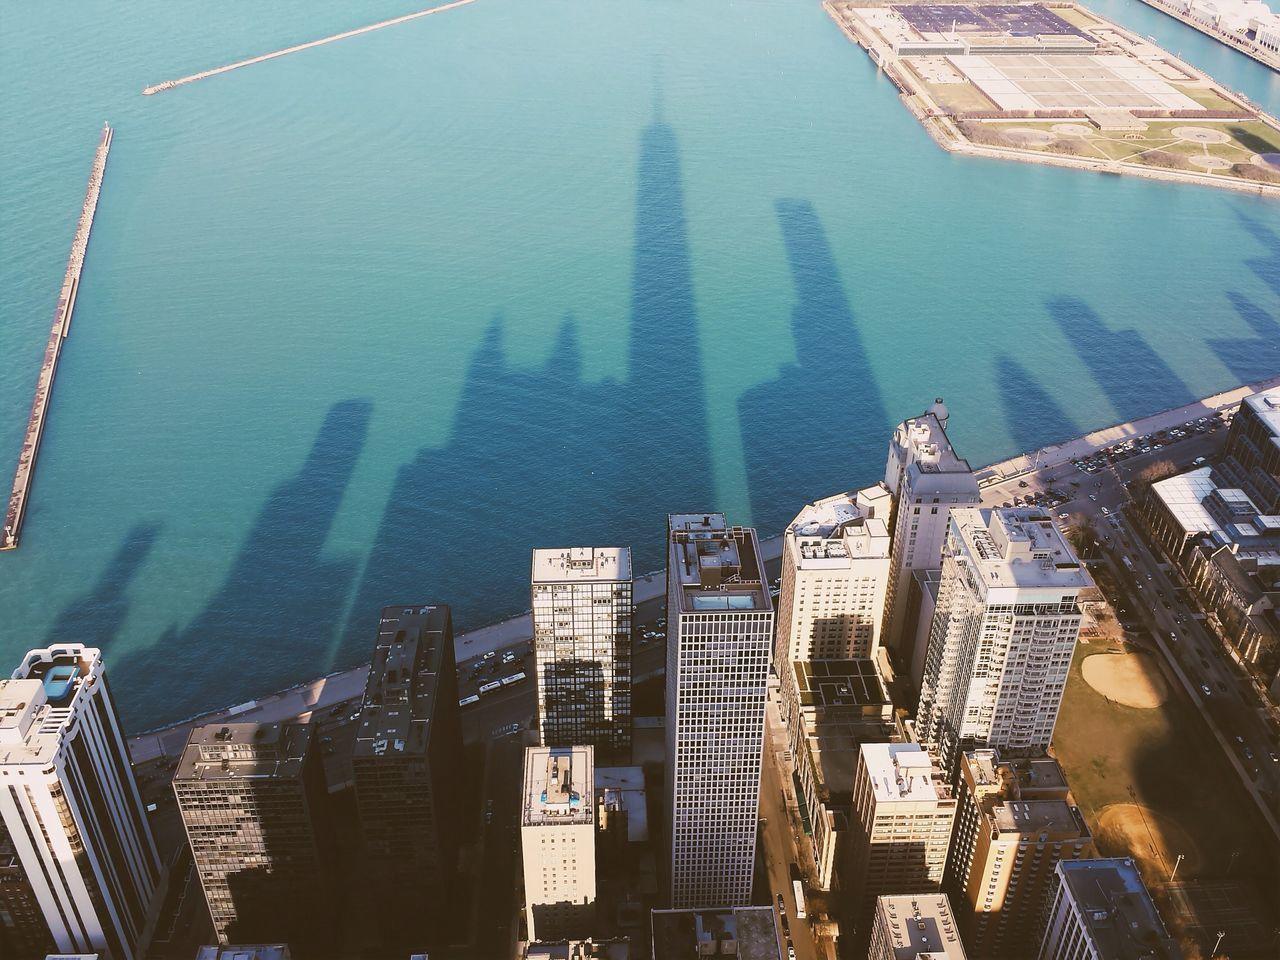 Shadow of city skyline on sea